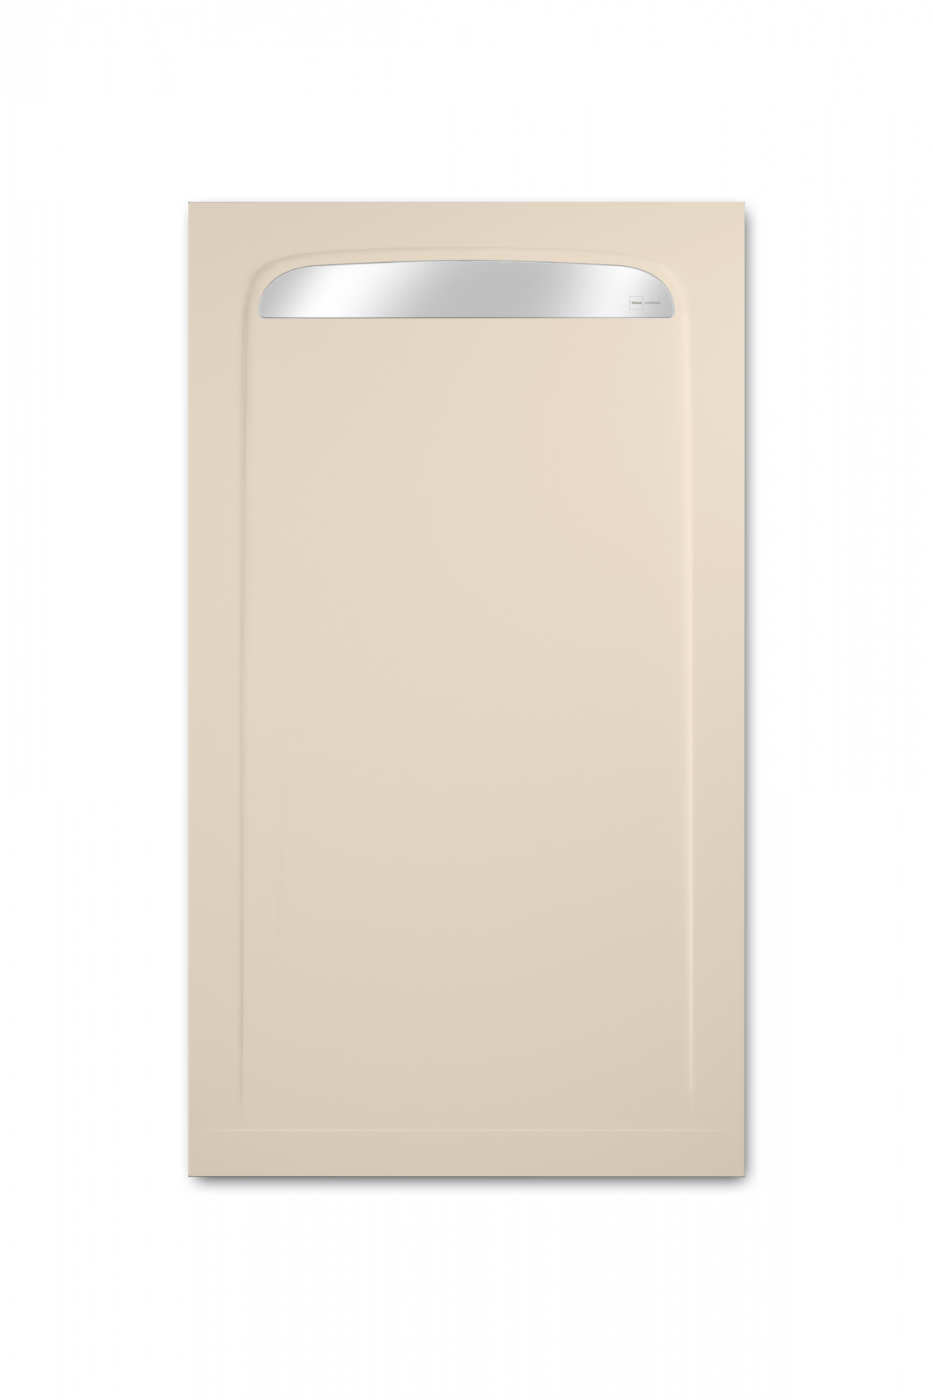 Plato de ducha XL - ancho 80cm